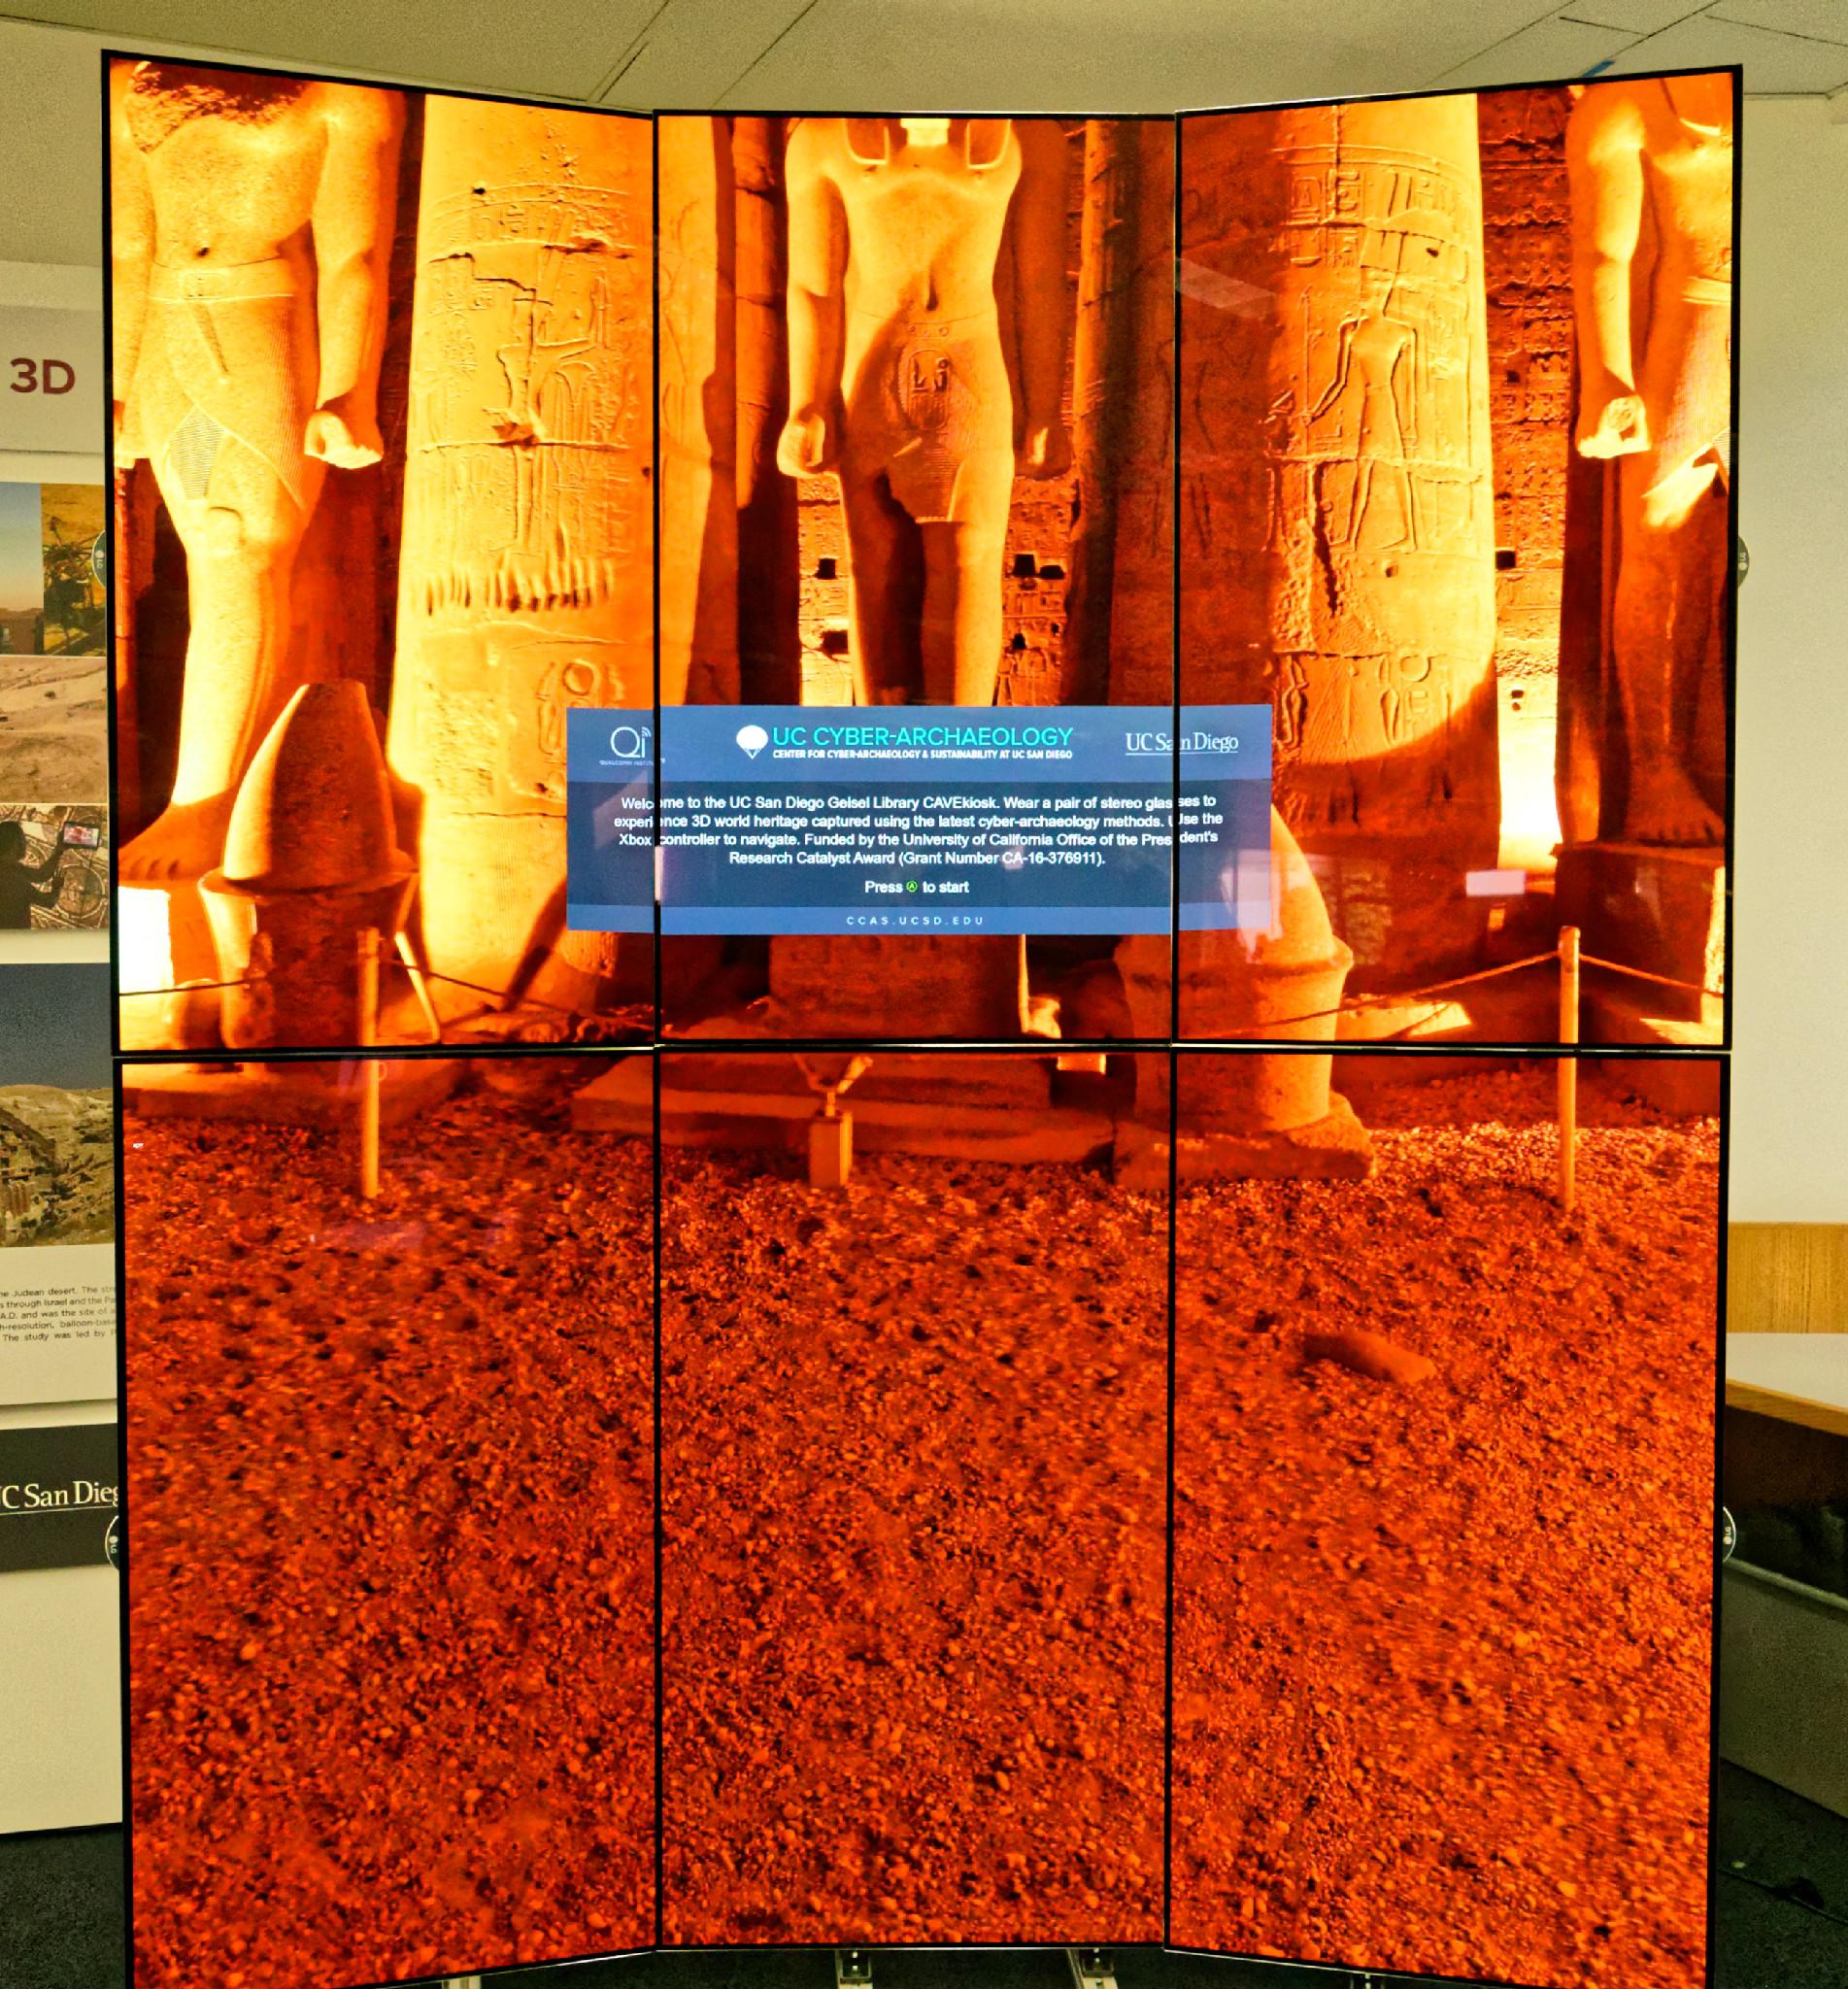 CAVEkiosk-3DAnsicht: Tal der Könige in Luxor